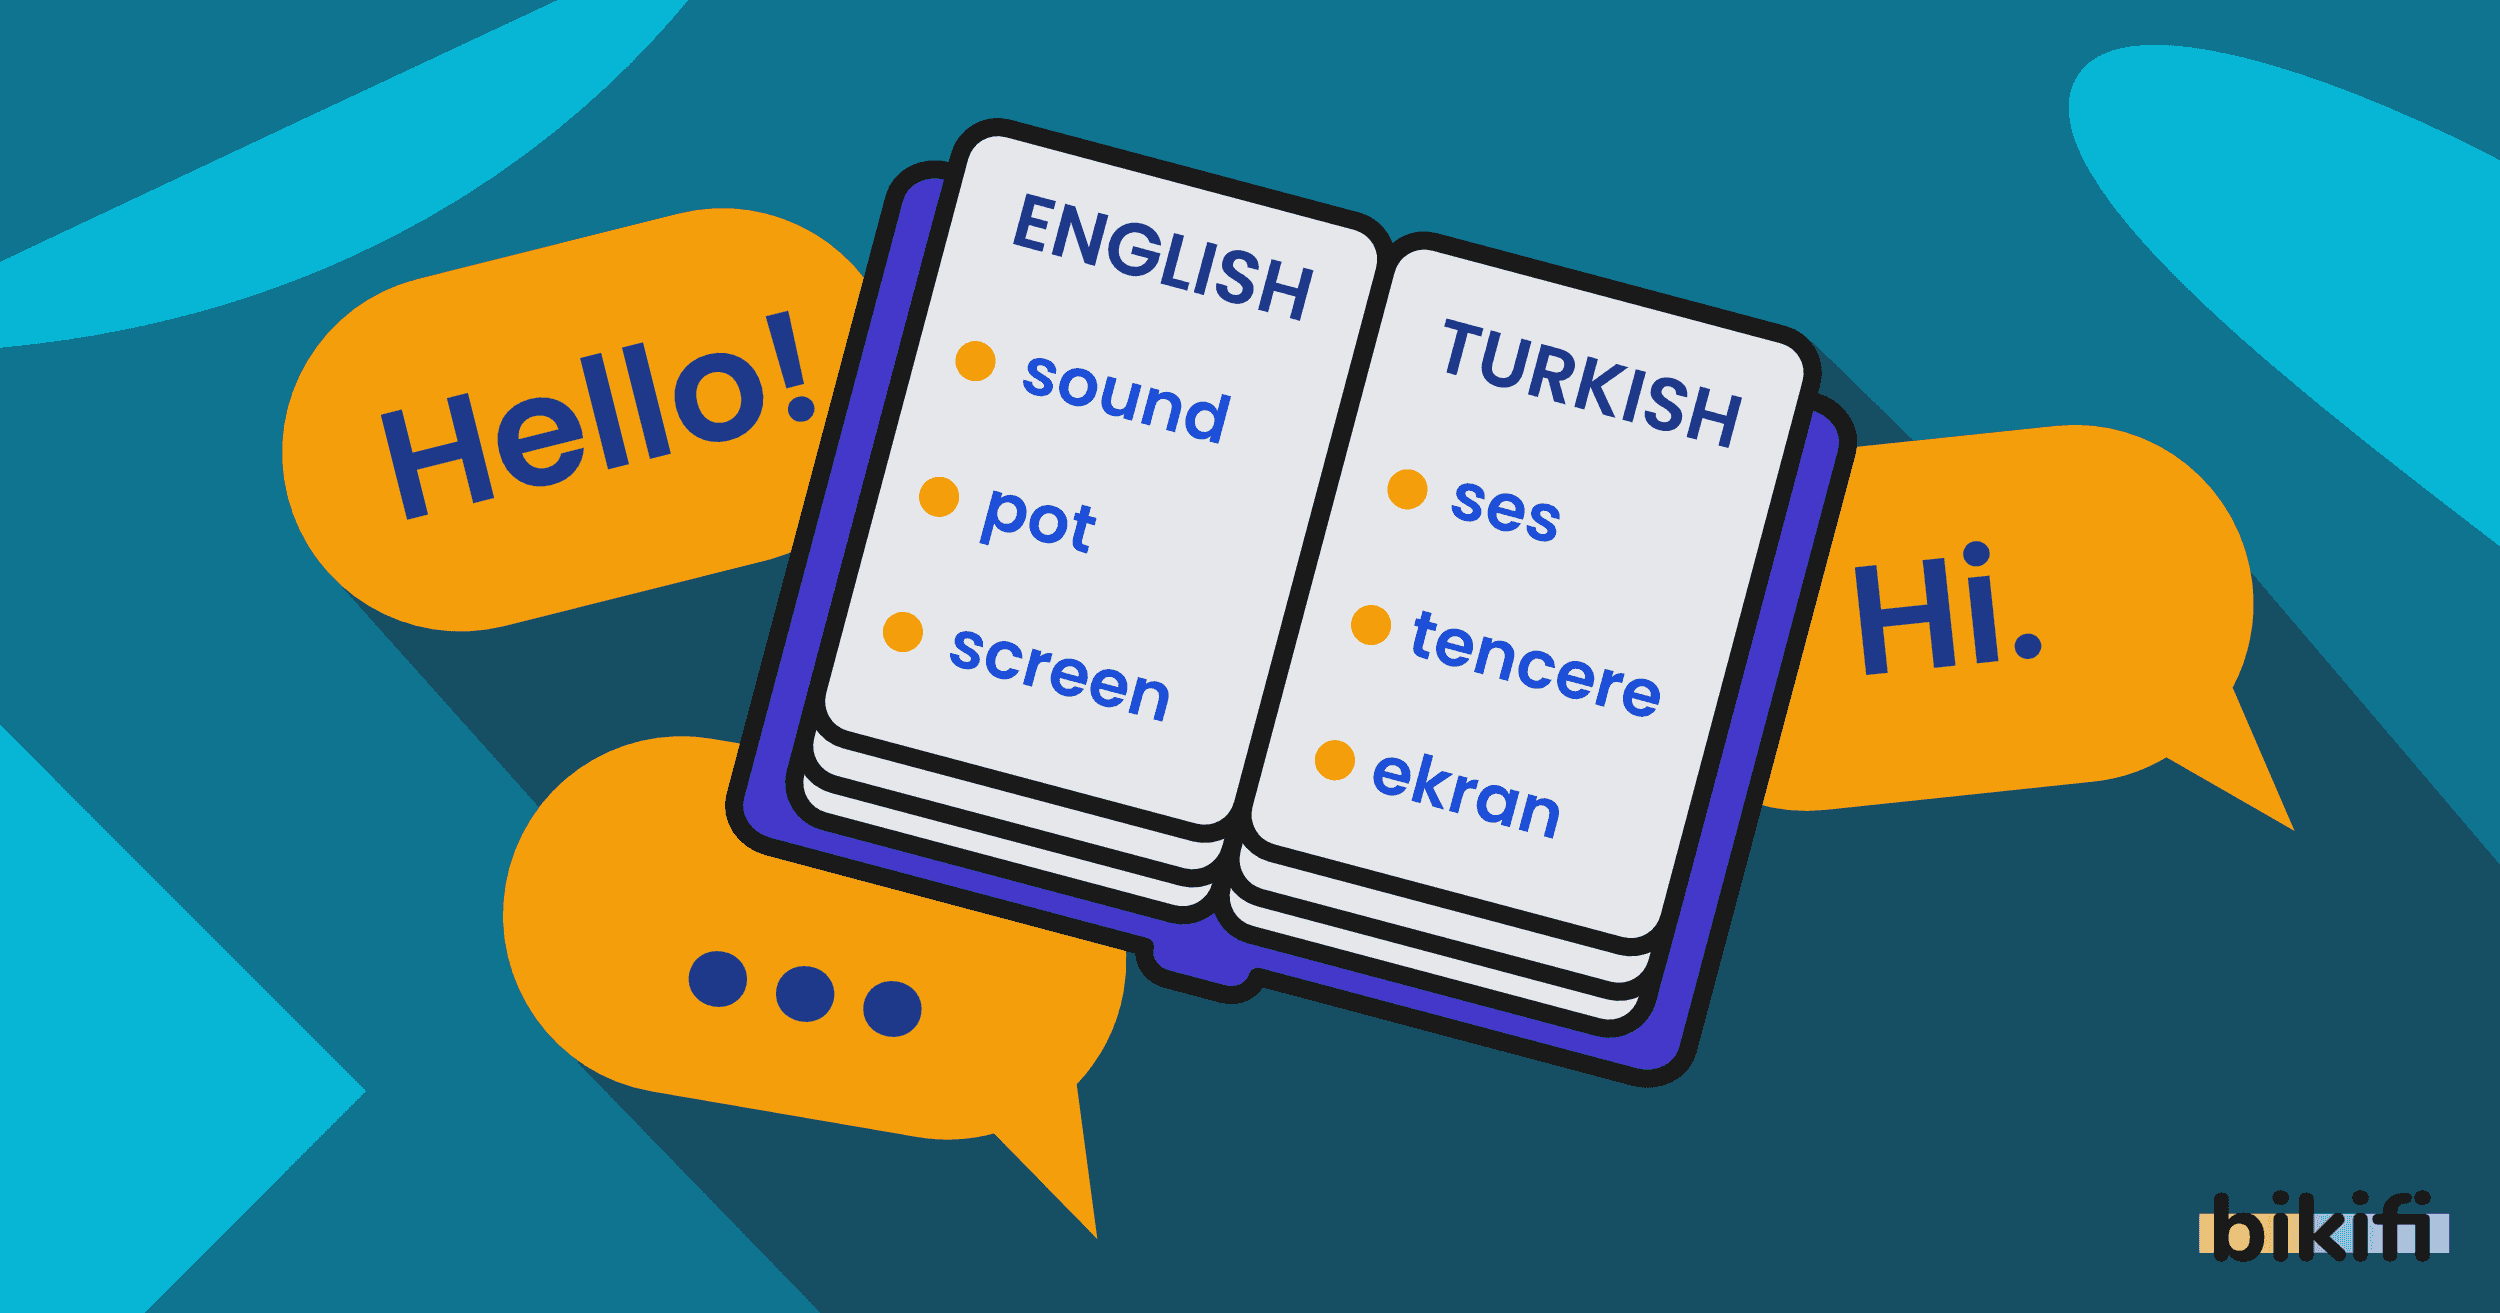 English as a Second Language (ESL) ya da EFL Hakkında